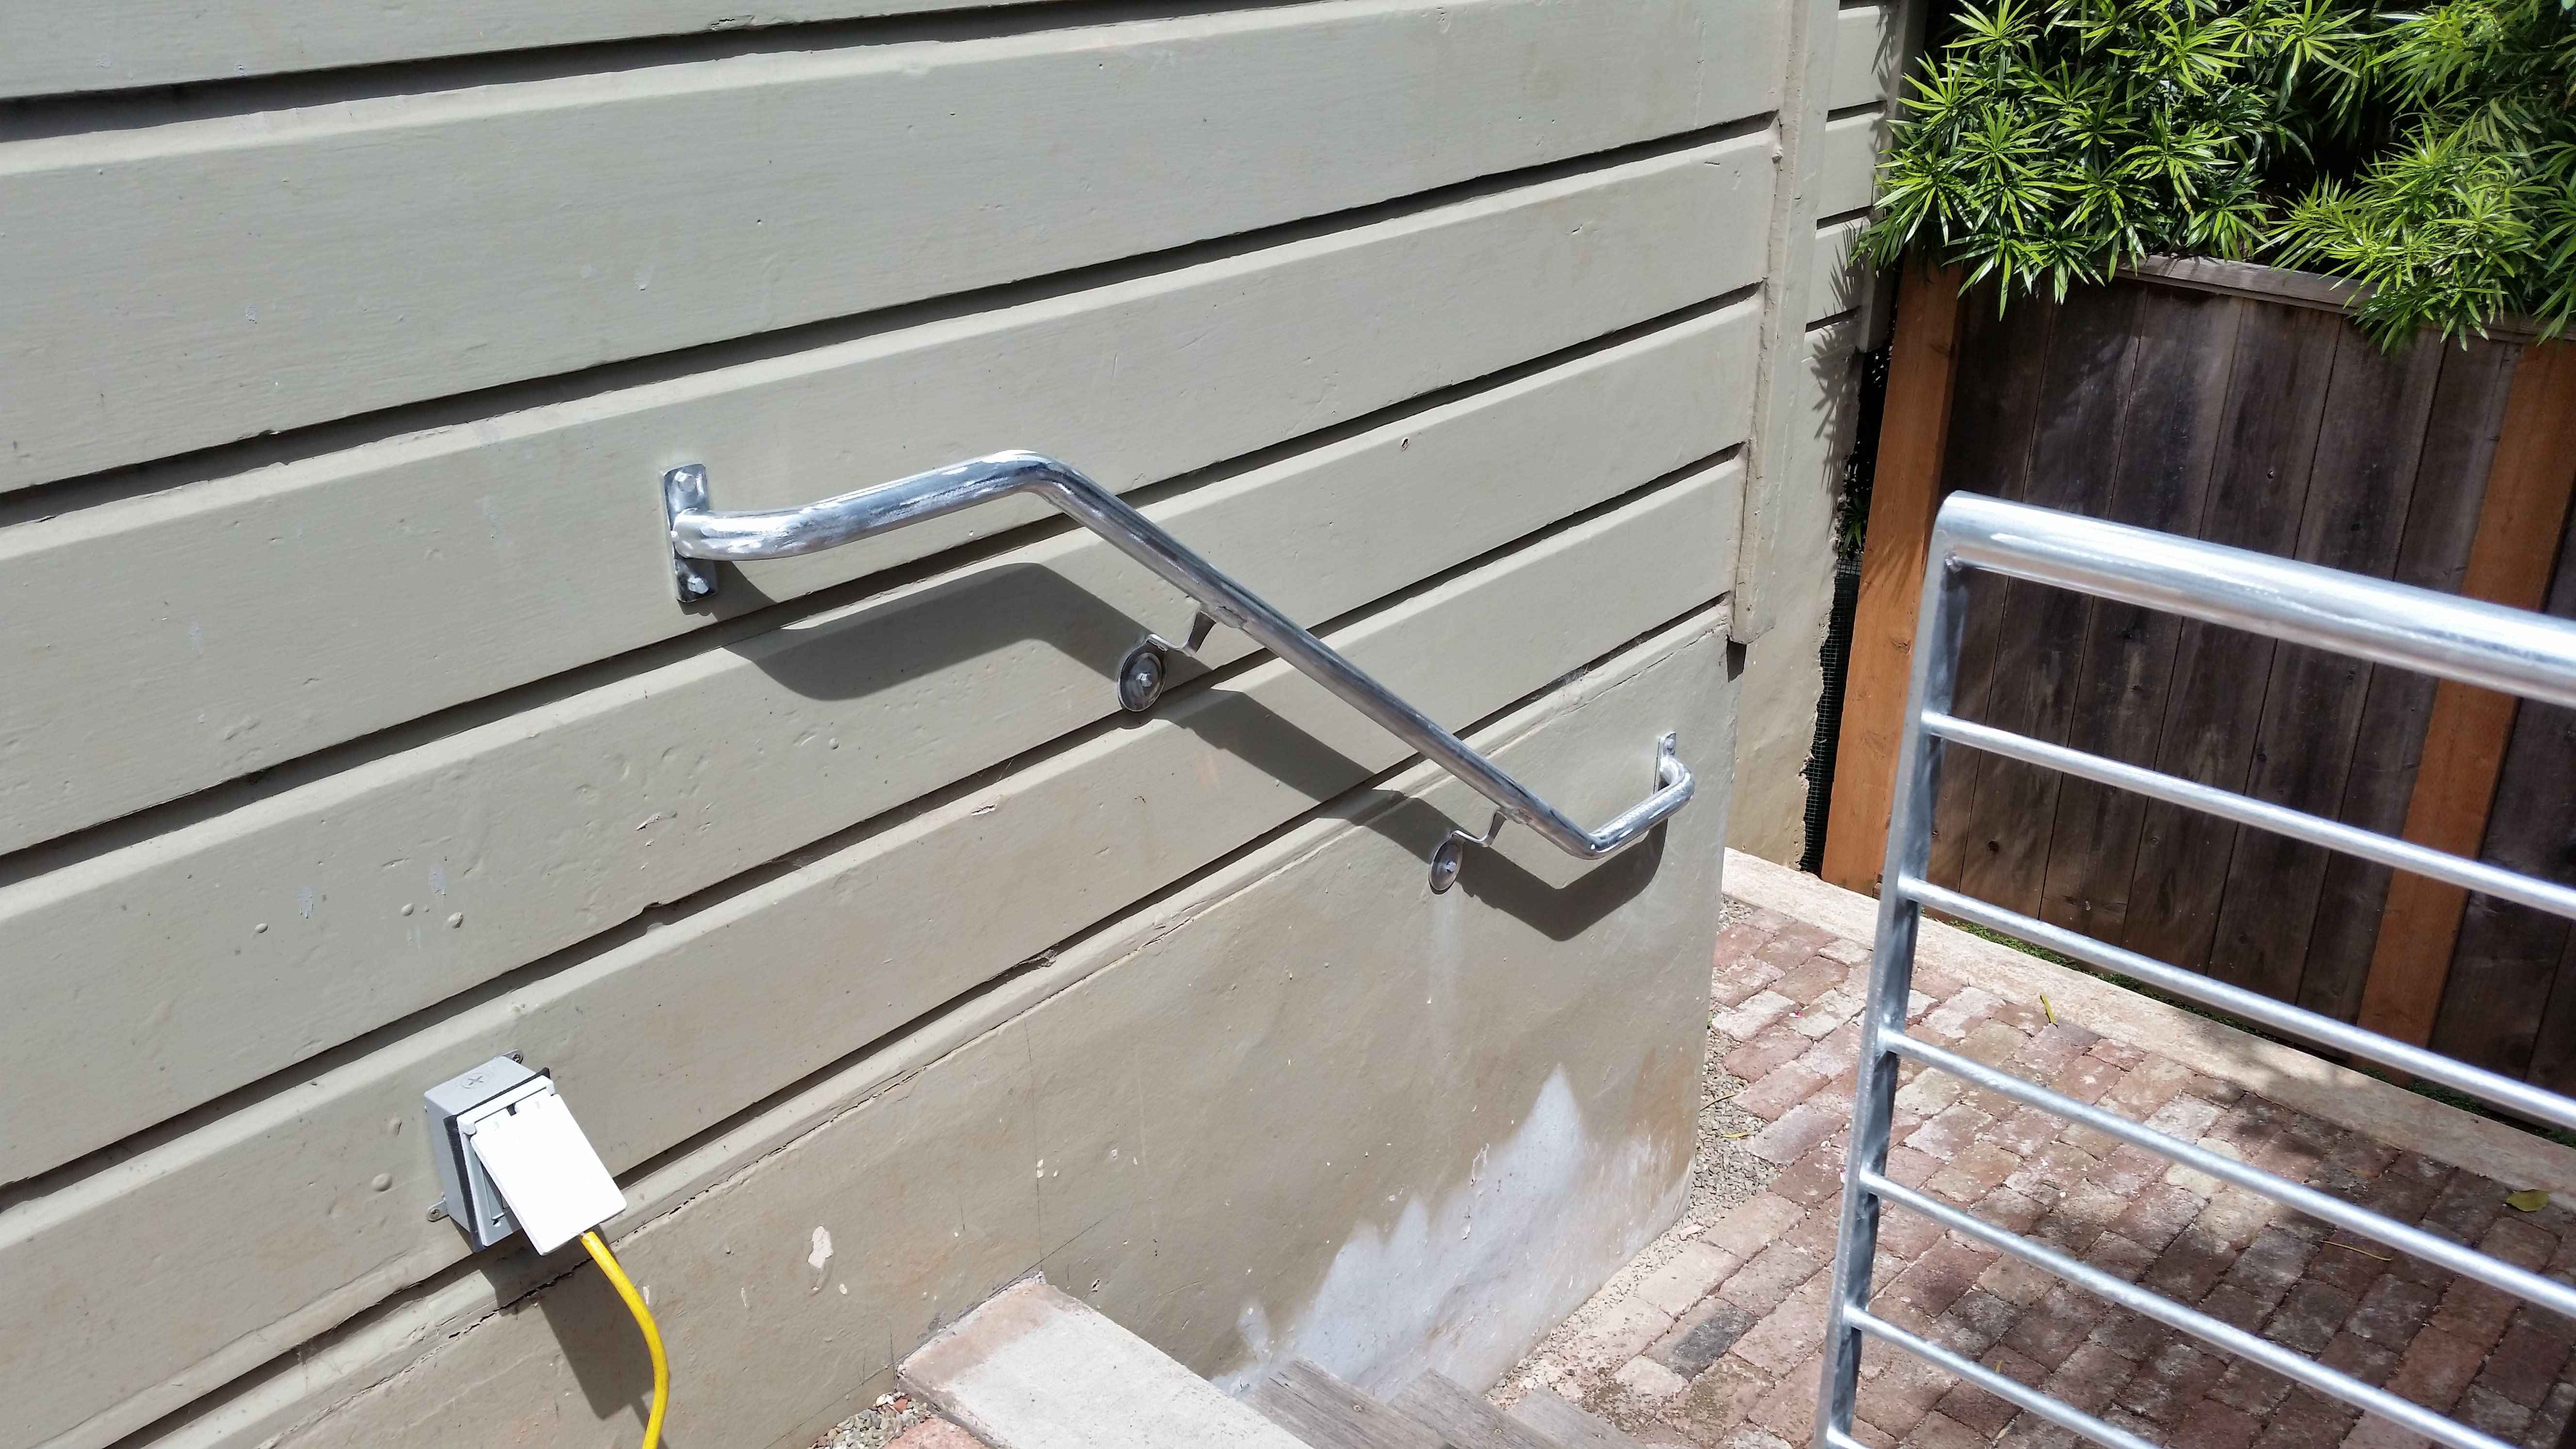 Handrail Example 4 (Round Tube)